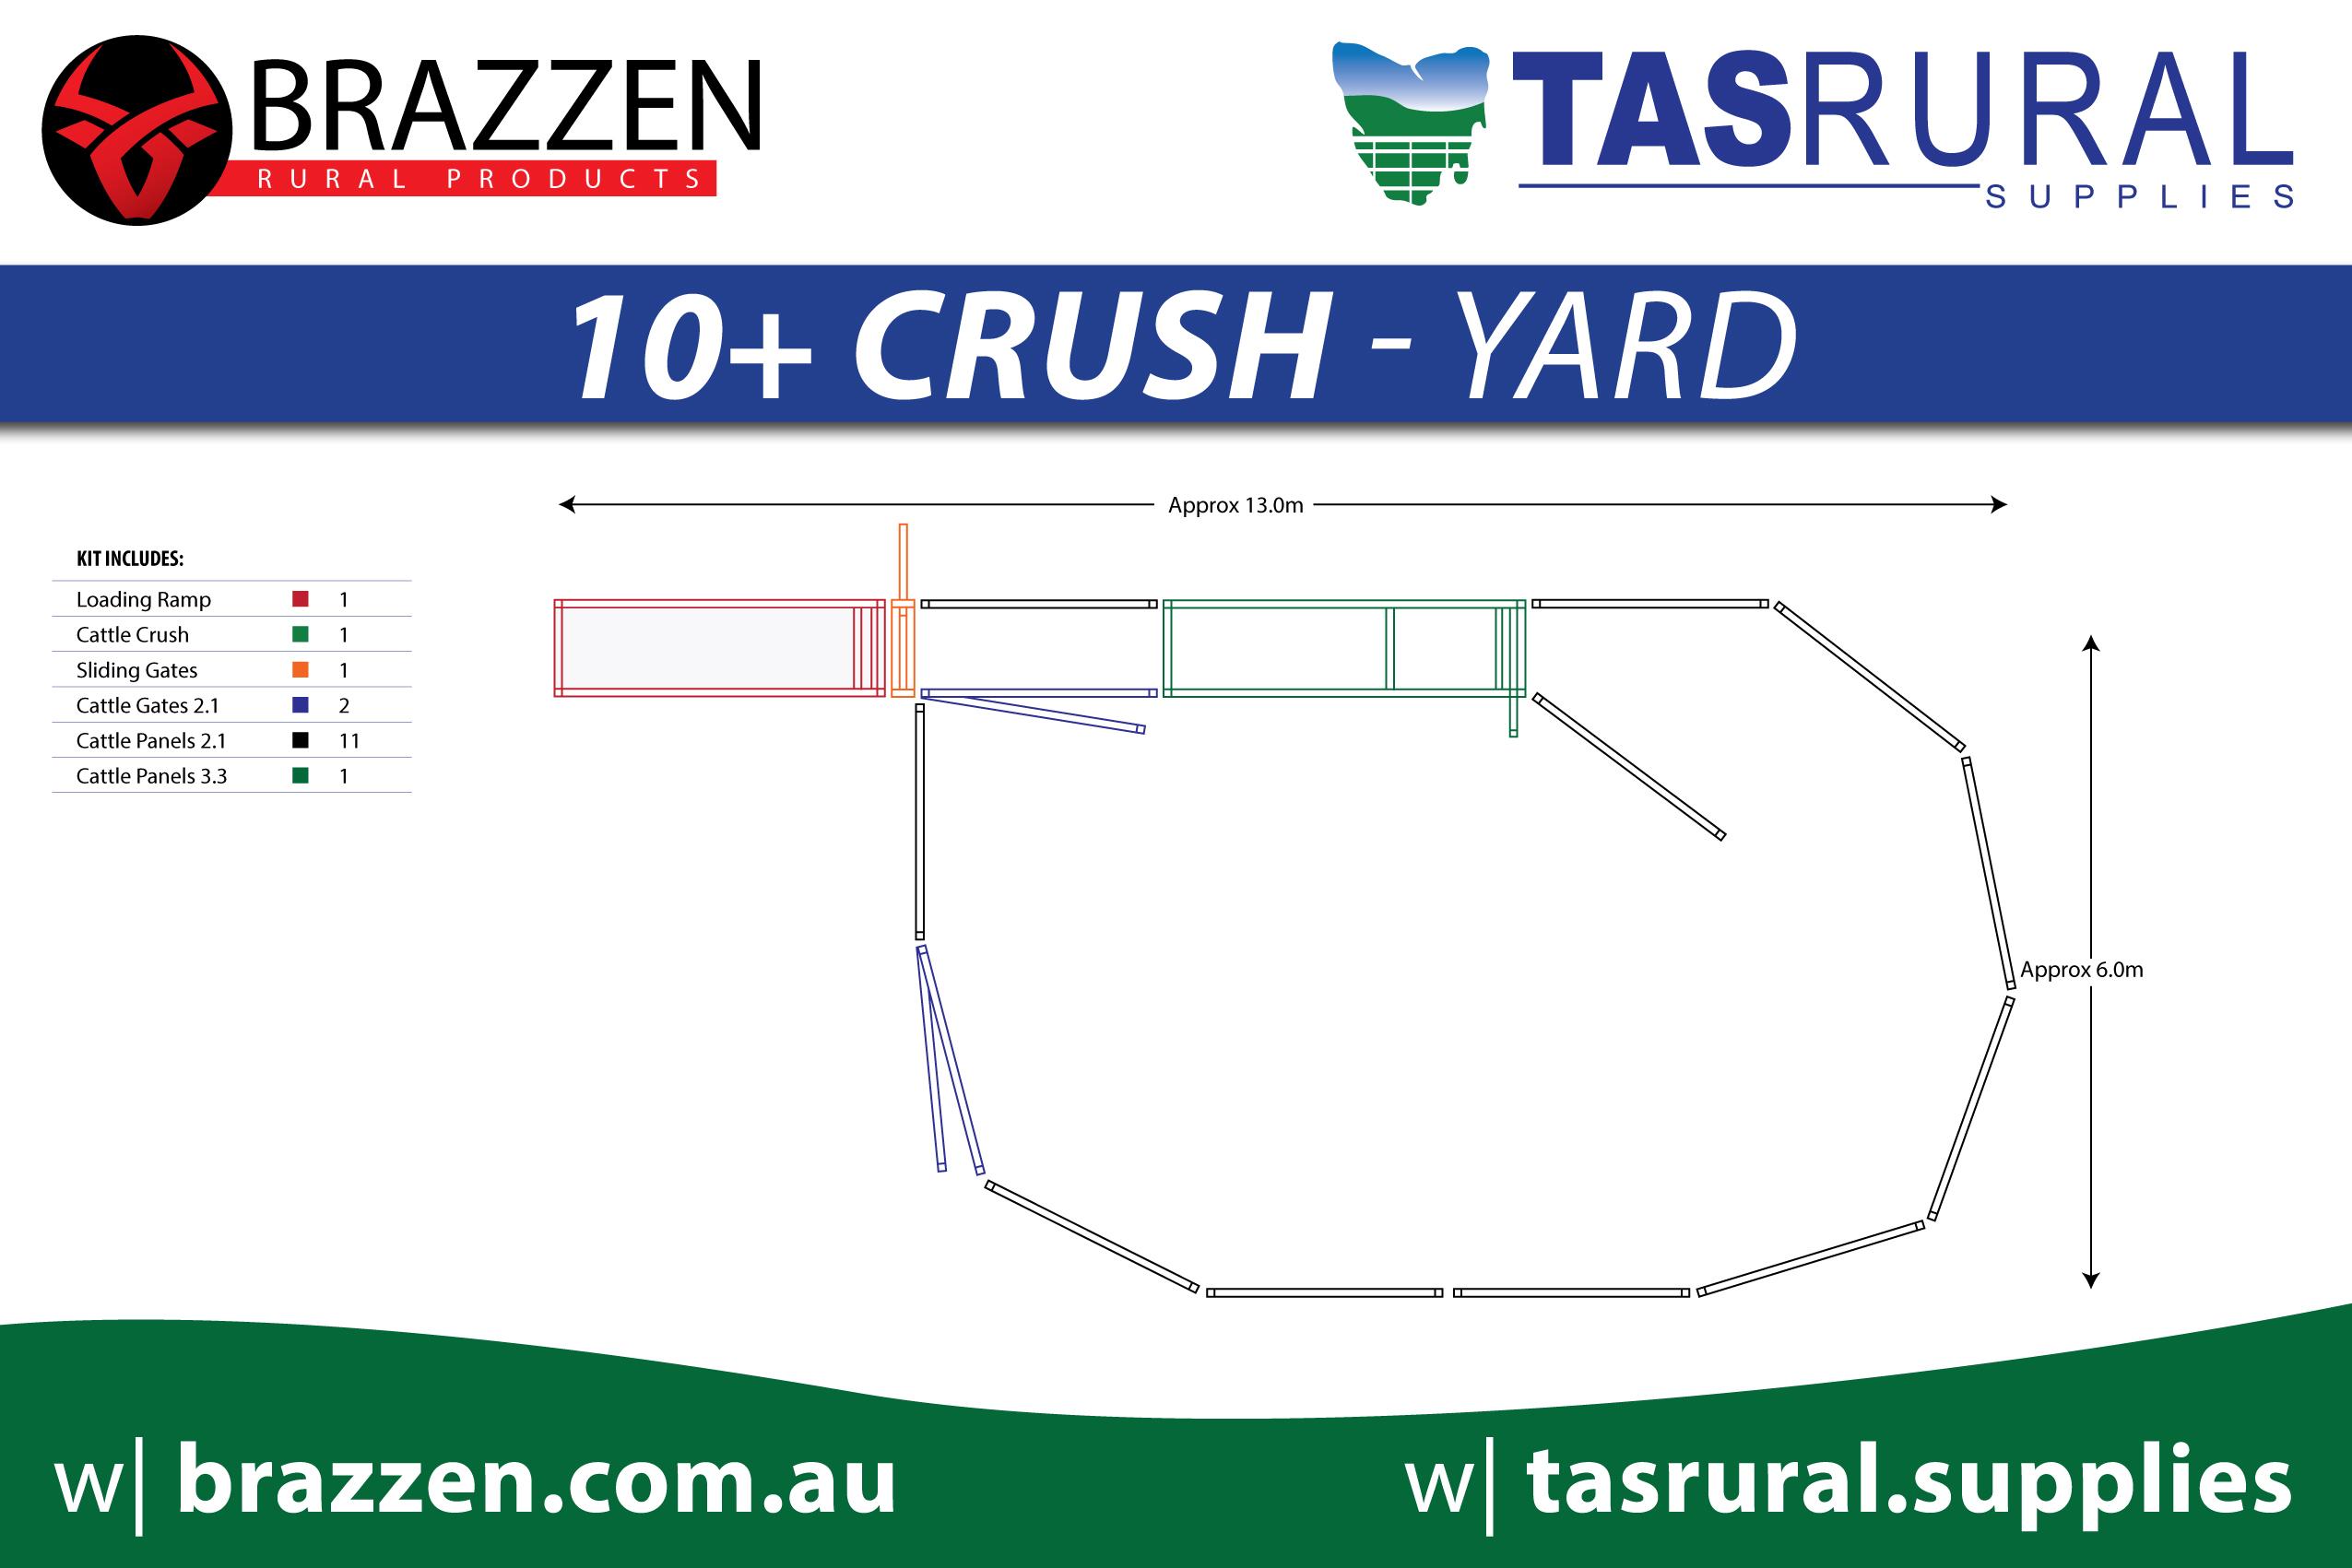 Tas Rural Yards 2019-10+ Crush yard